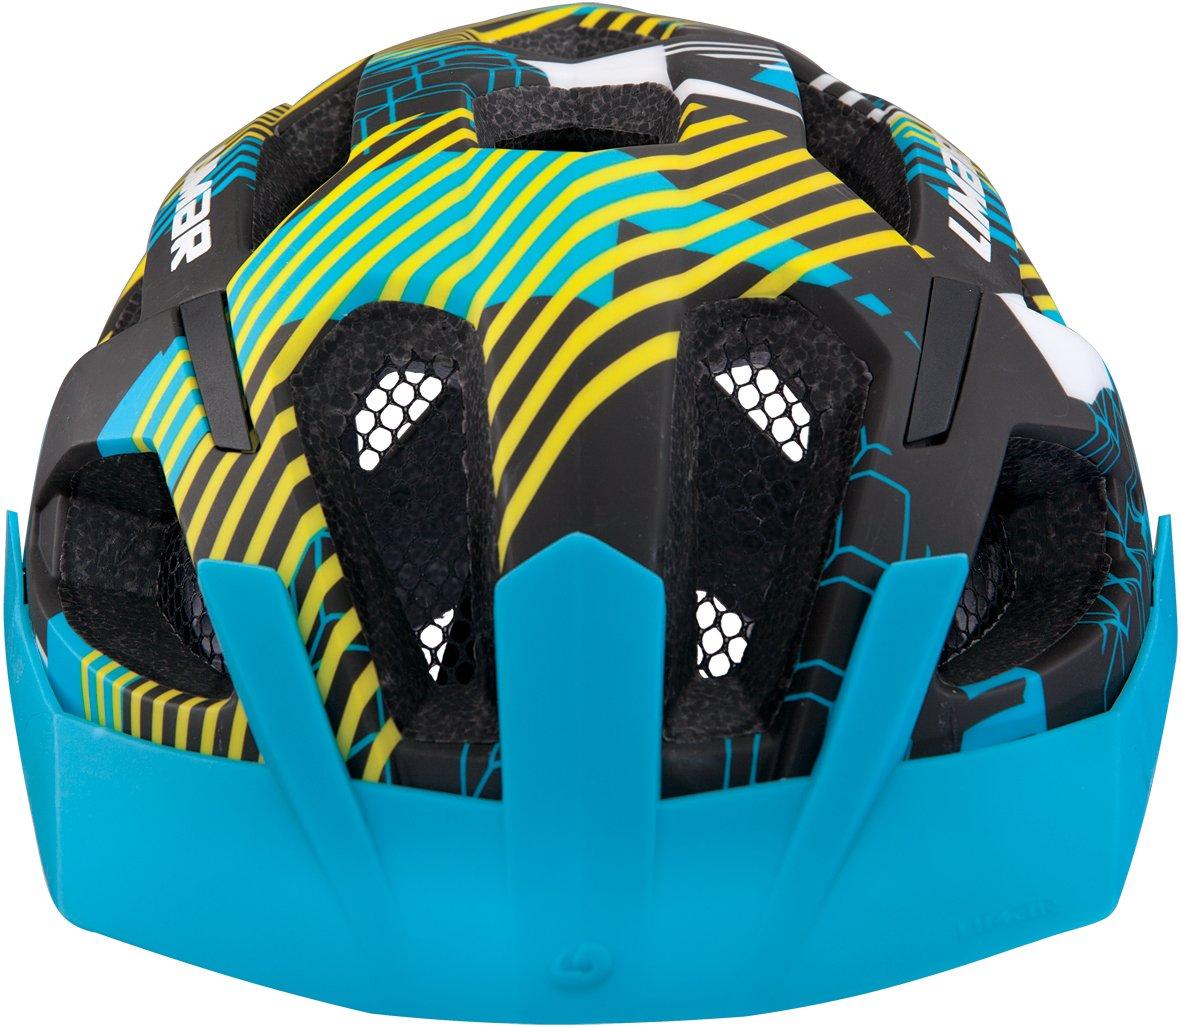 Limar X-MTB Bike Helmet